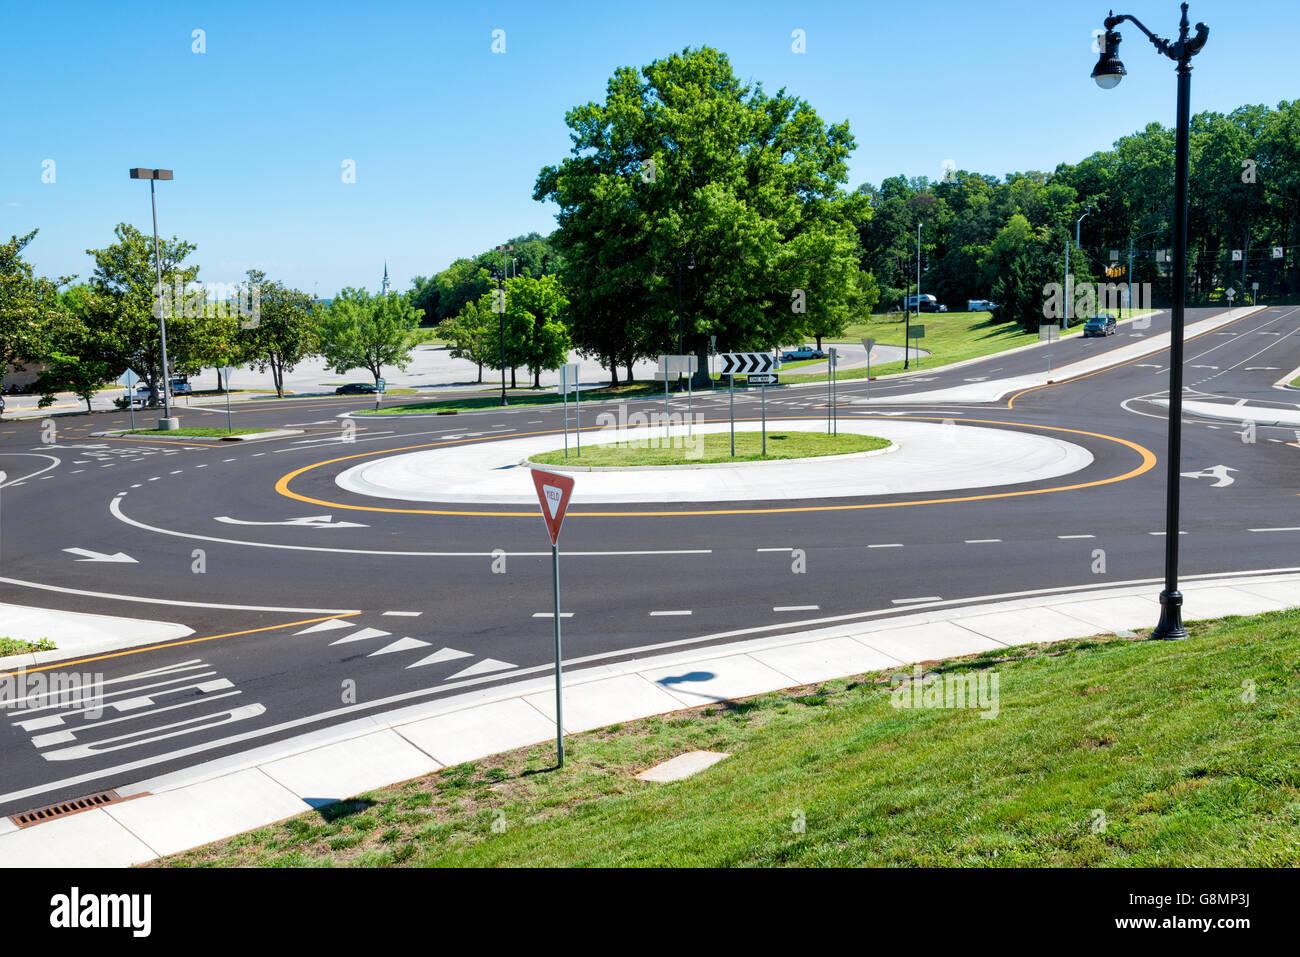 Rond-point de circulation intersection dans les banlieues. Plan horizontal Photo Stock